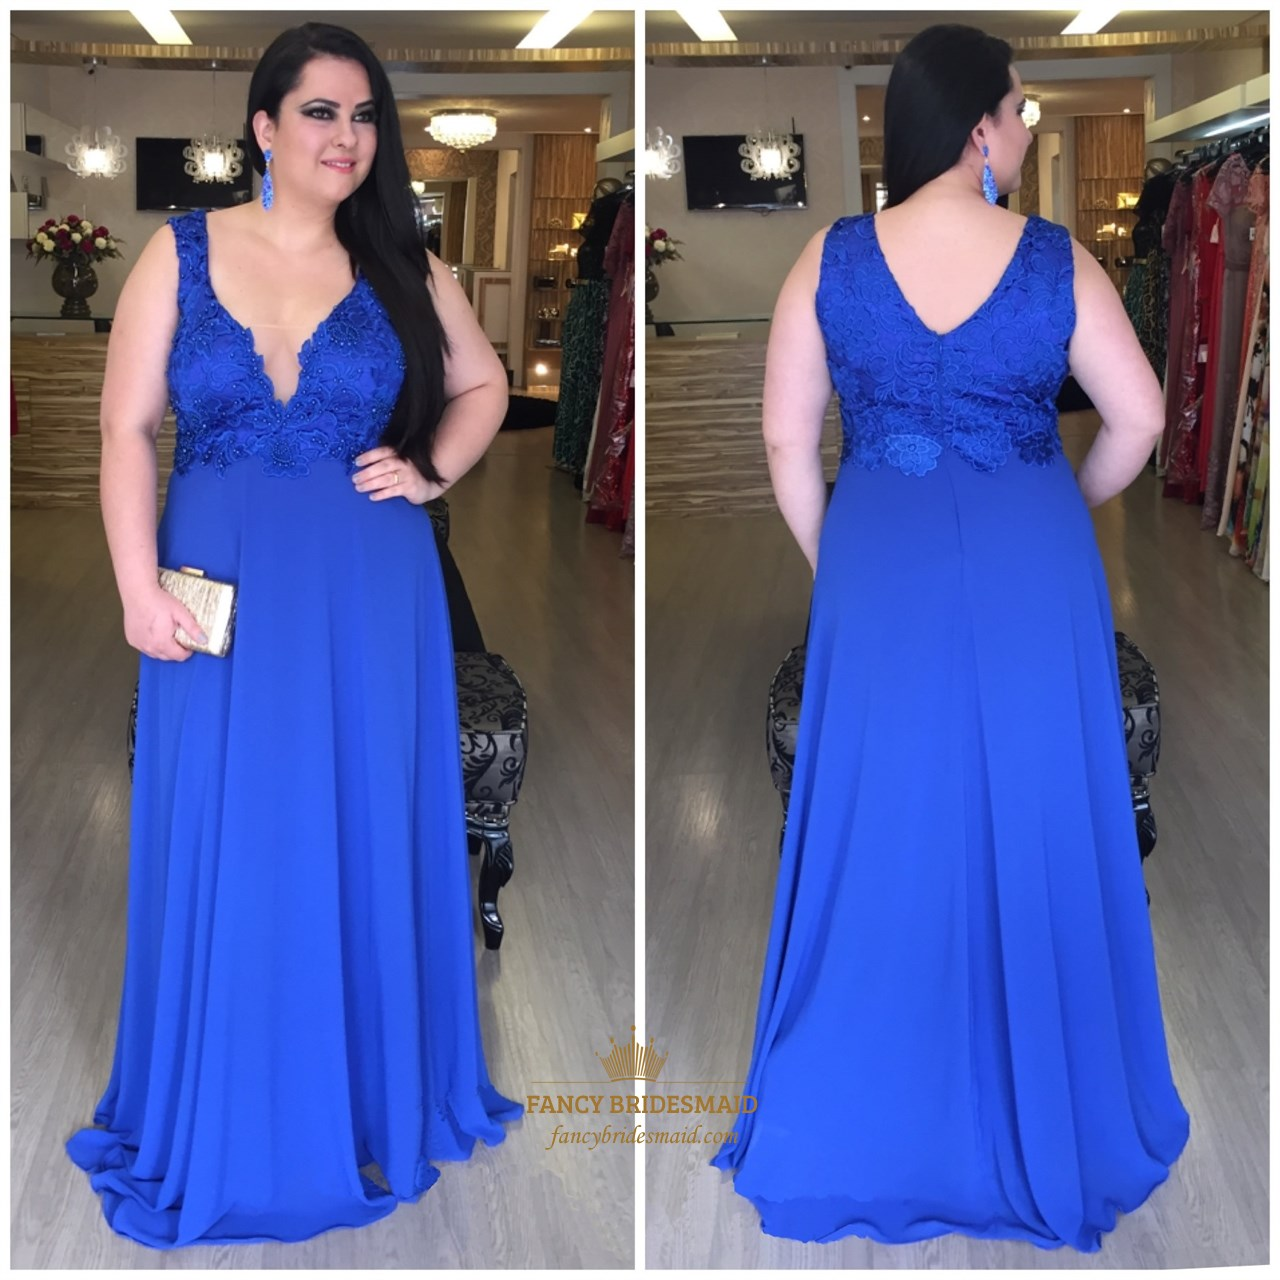 9e0b27753fc30 Royal Blue V Neck Lace Embellished Bodice Chiffon Long Prom Dress SKU -FC854